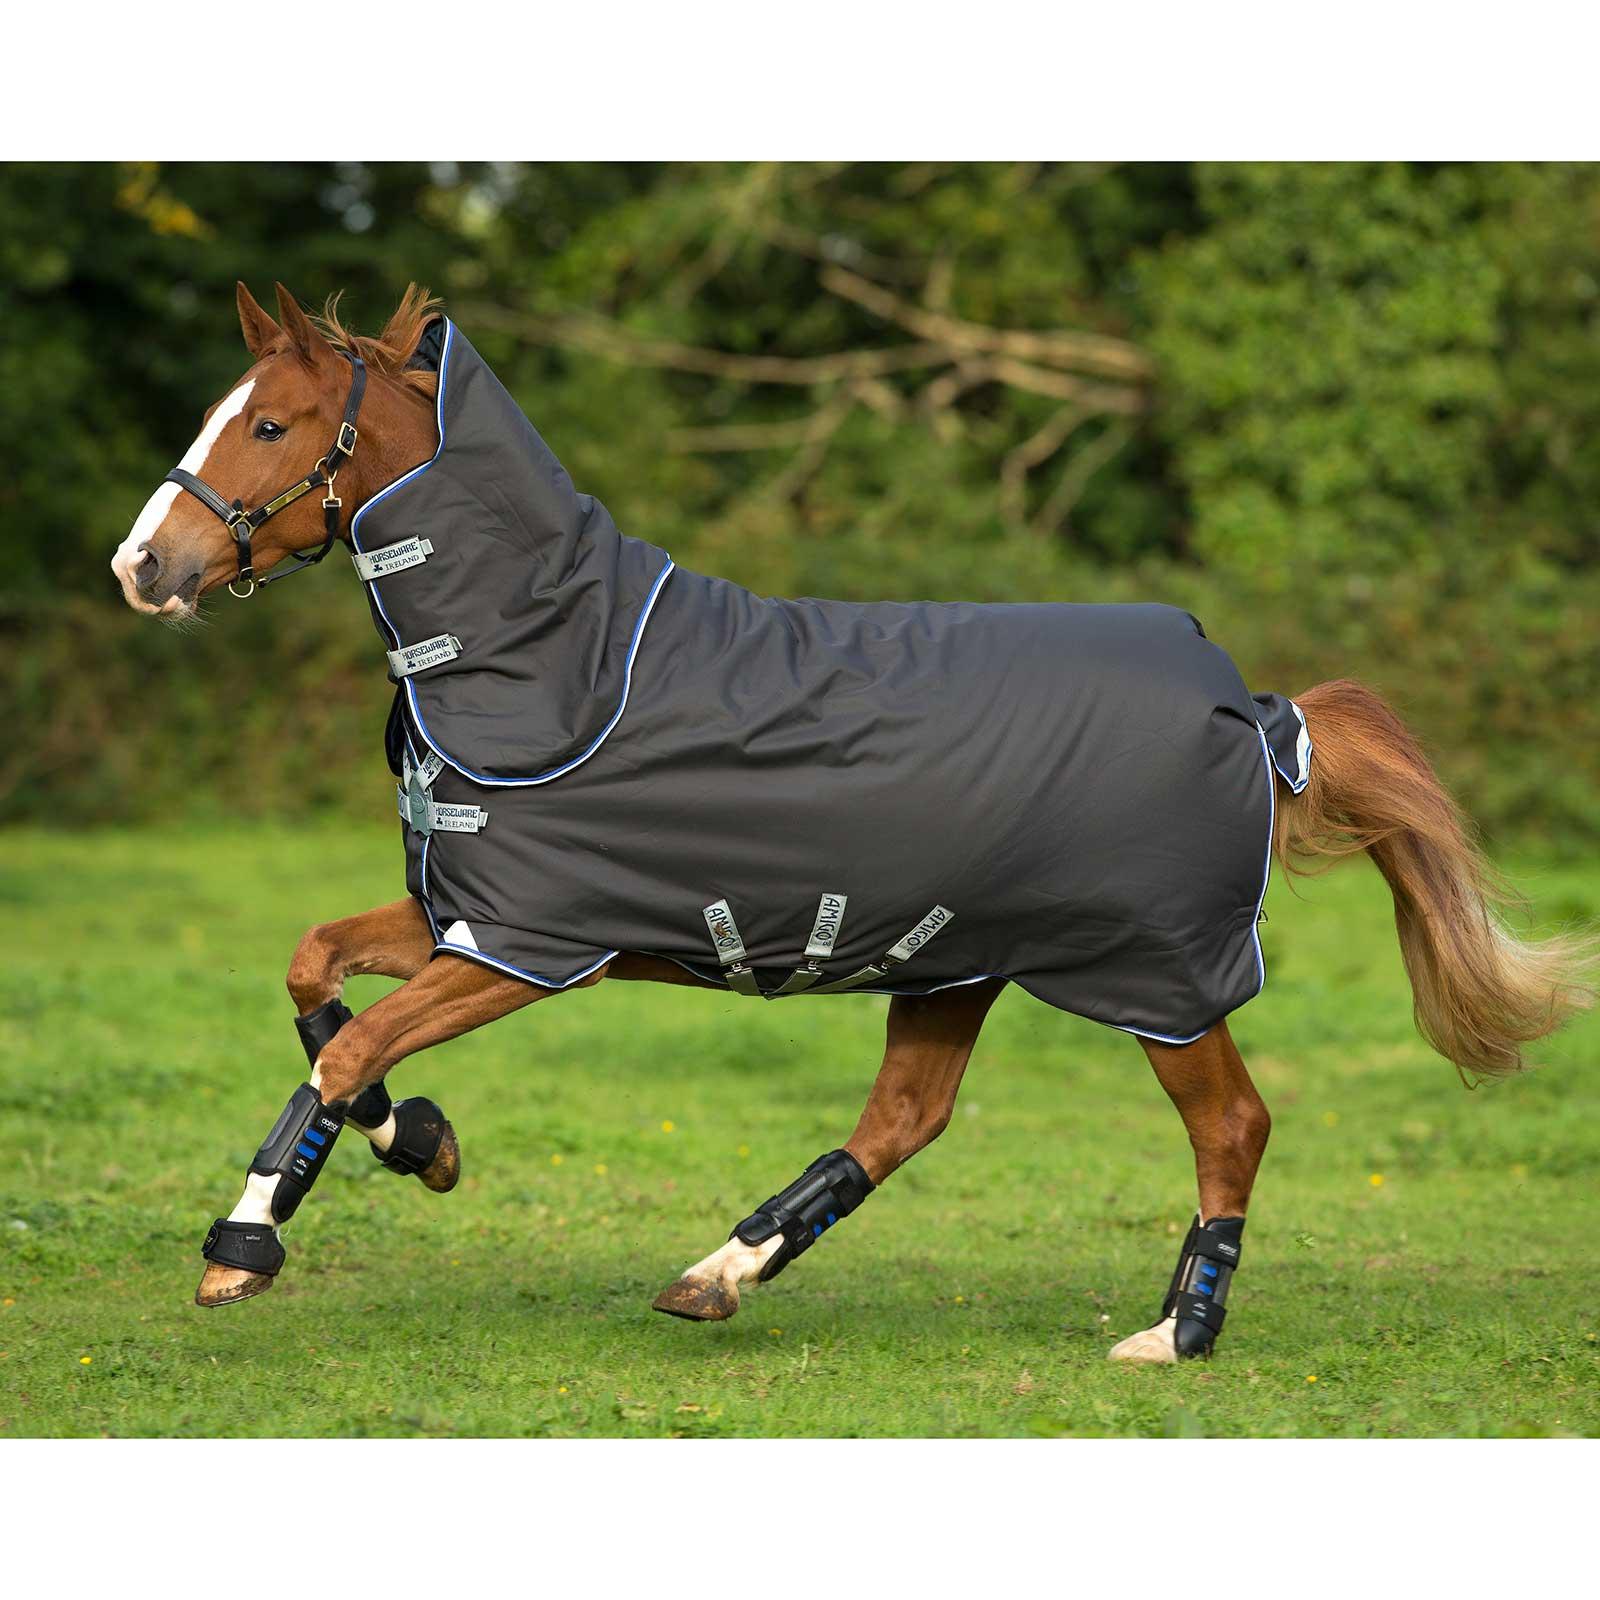 Horseware Amigo Bravo 12 Plus Tournout